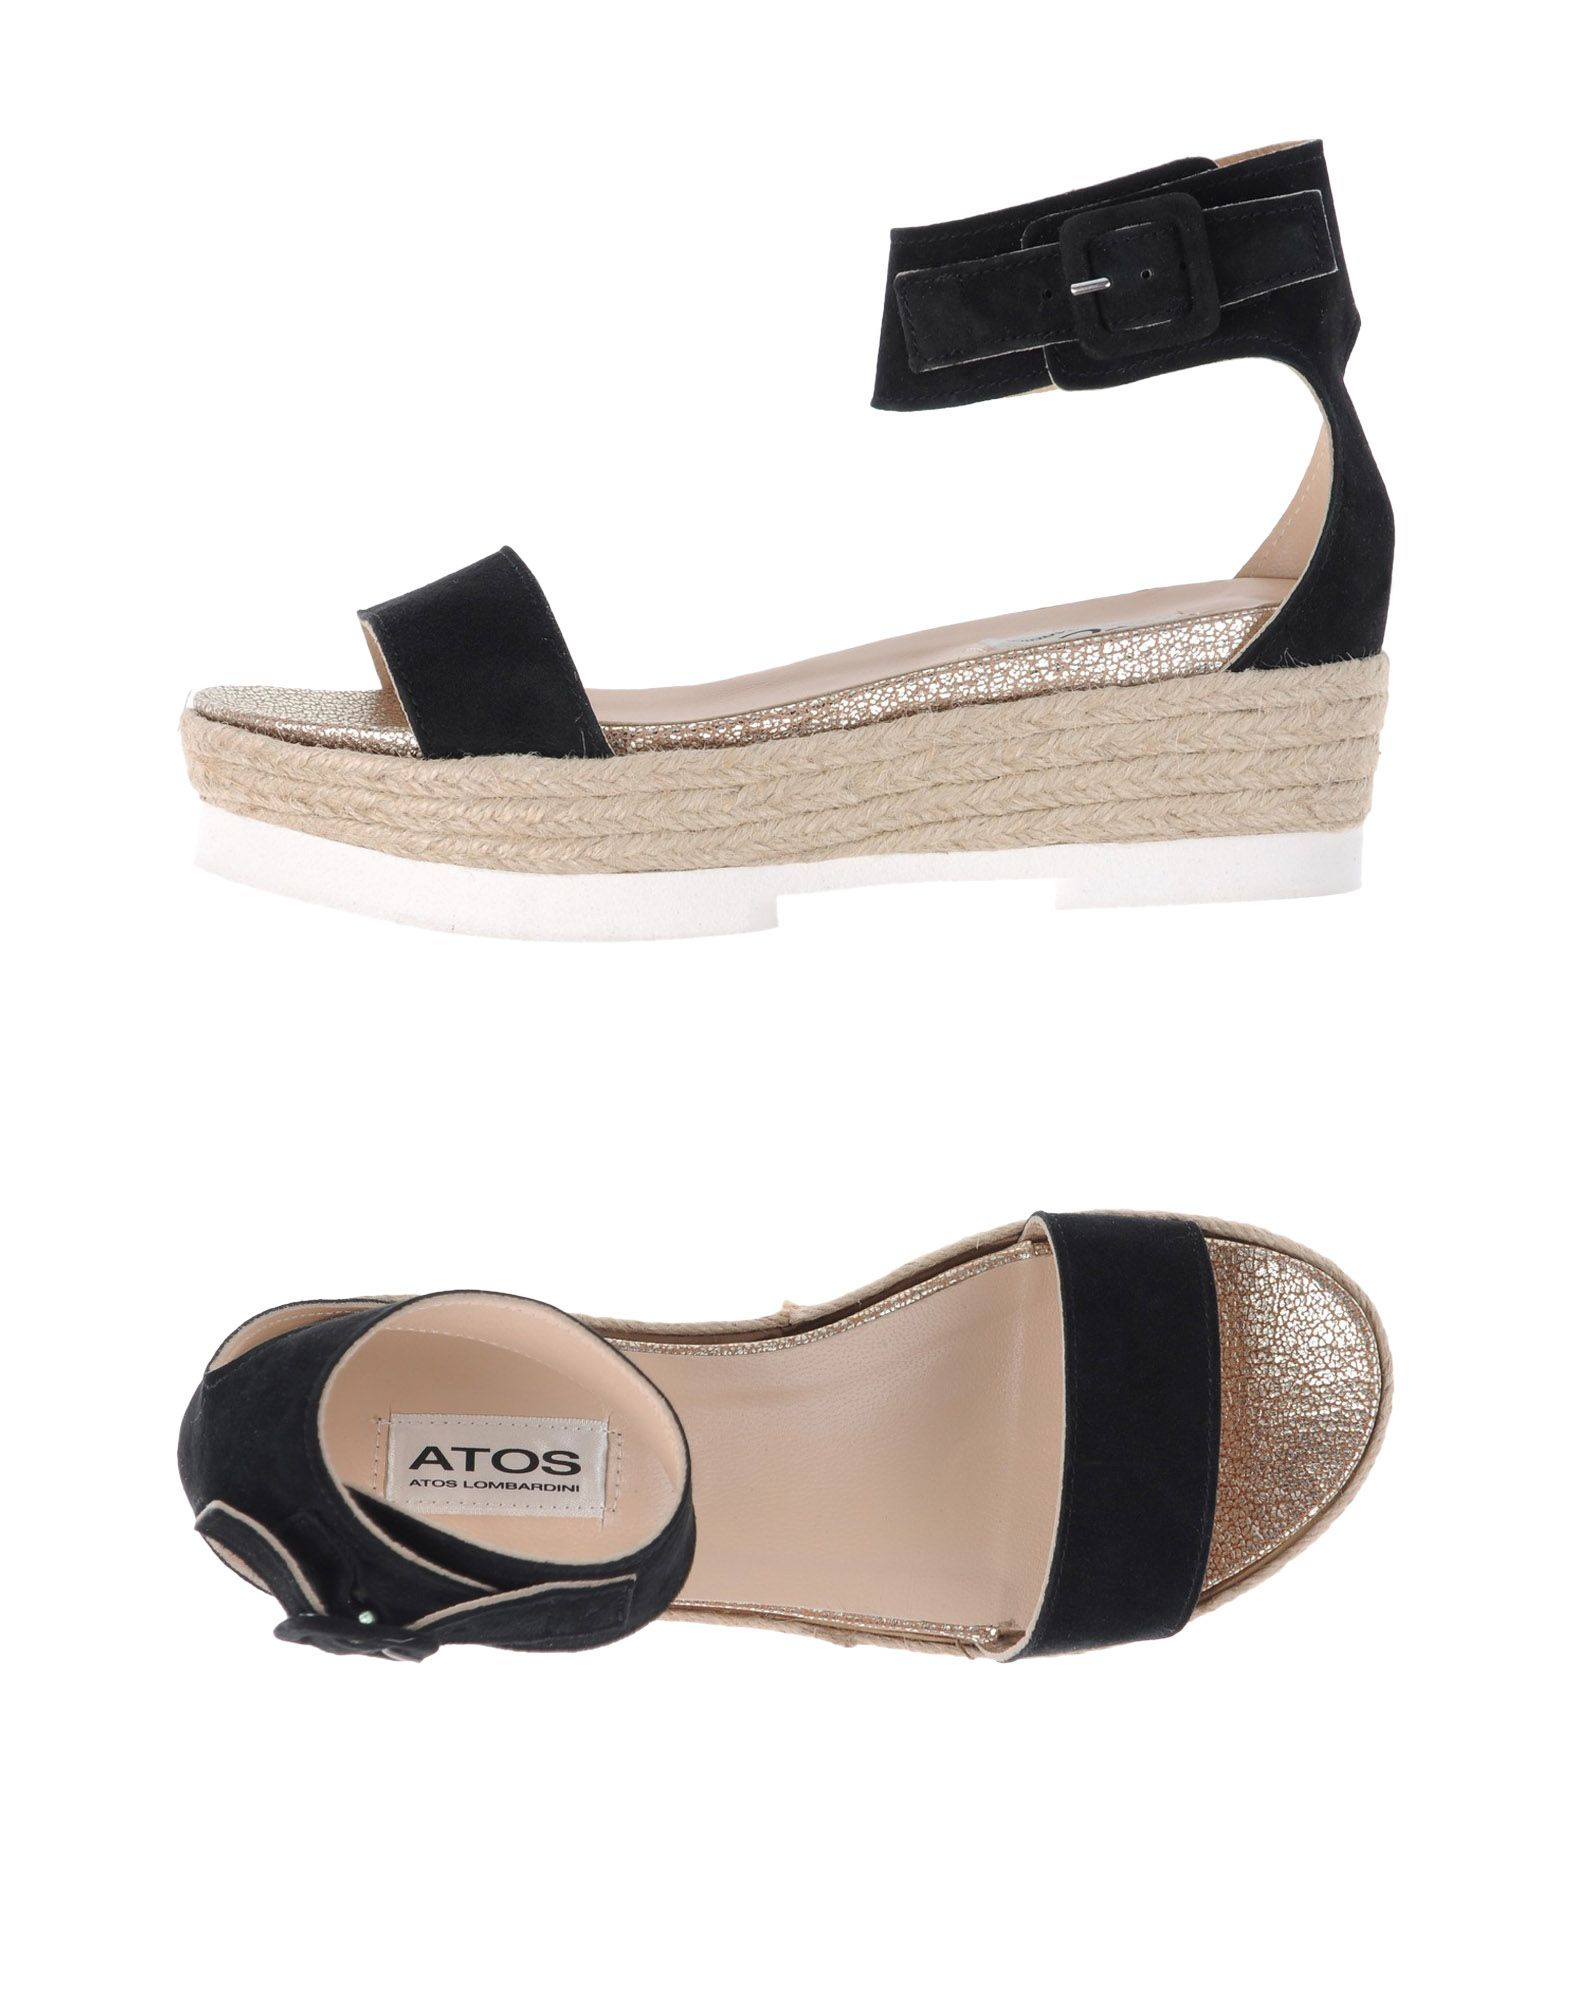 Atos Atos Lombardini Espadrilles Damen  11332832AU Gute Qualität beliebte Schuhe